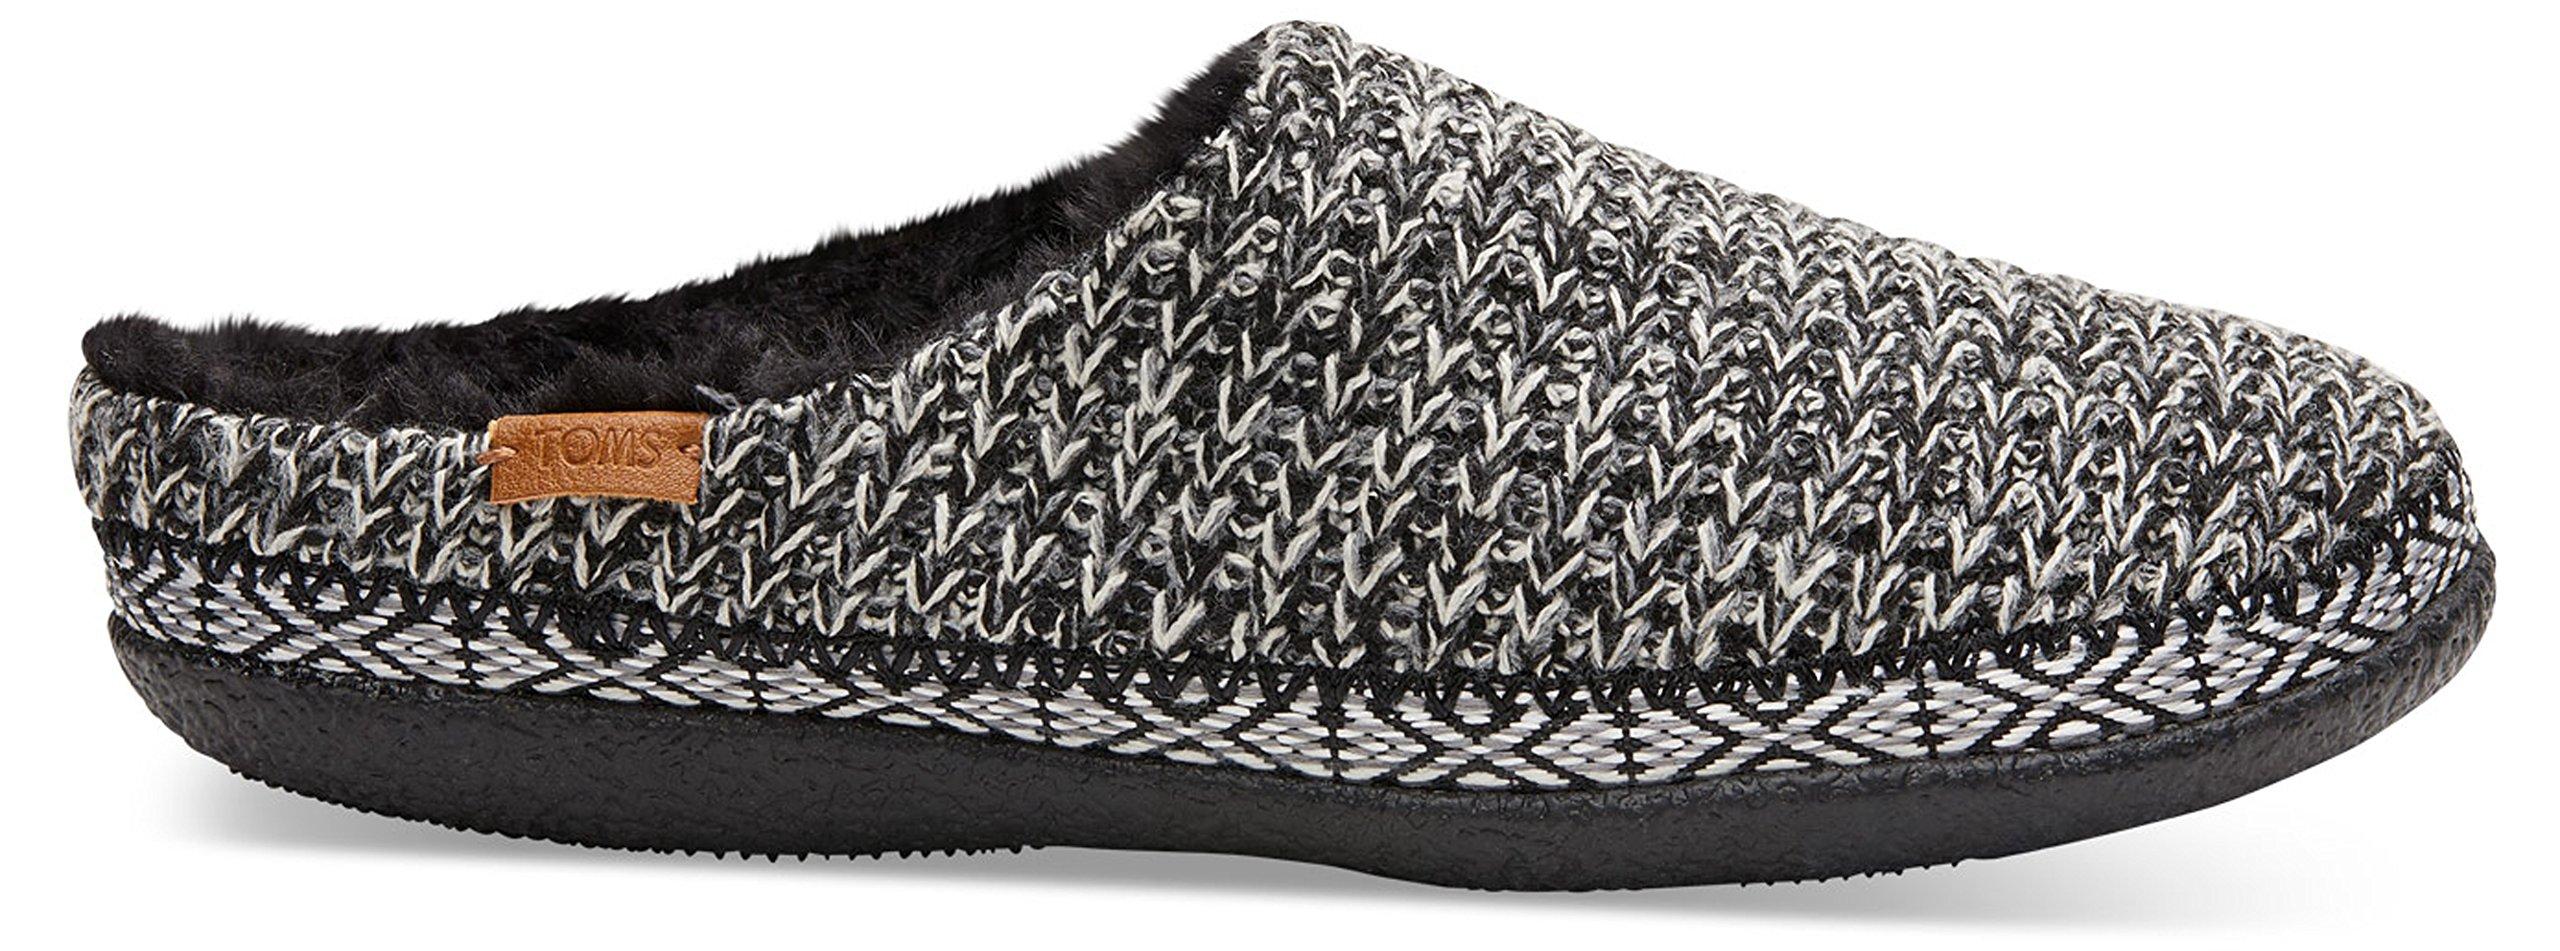 2efc2b78cf3 TOMS Women's Ivy Wool Slipper (11 B(M) US, Black and White Sweater Knit)